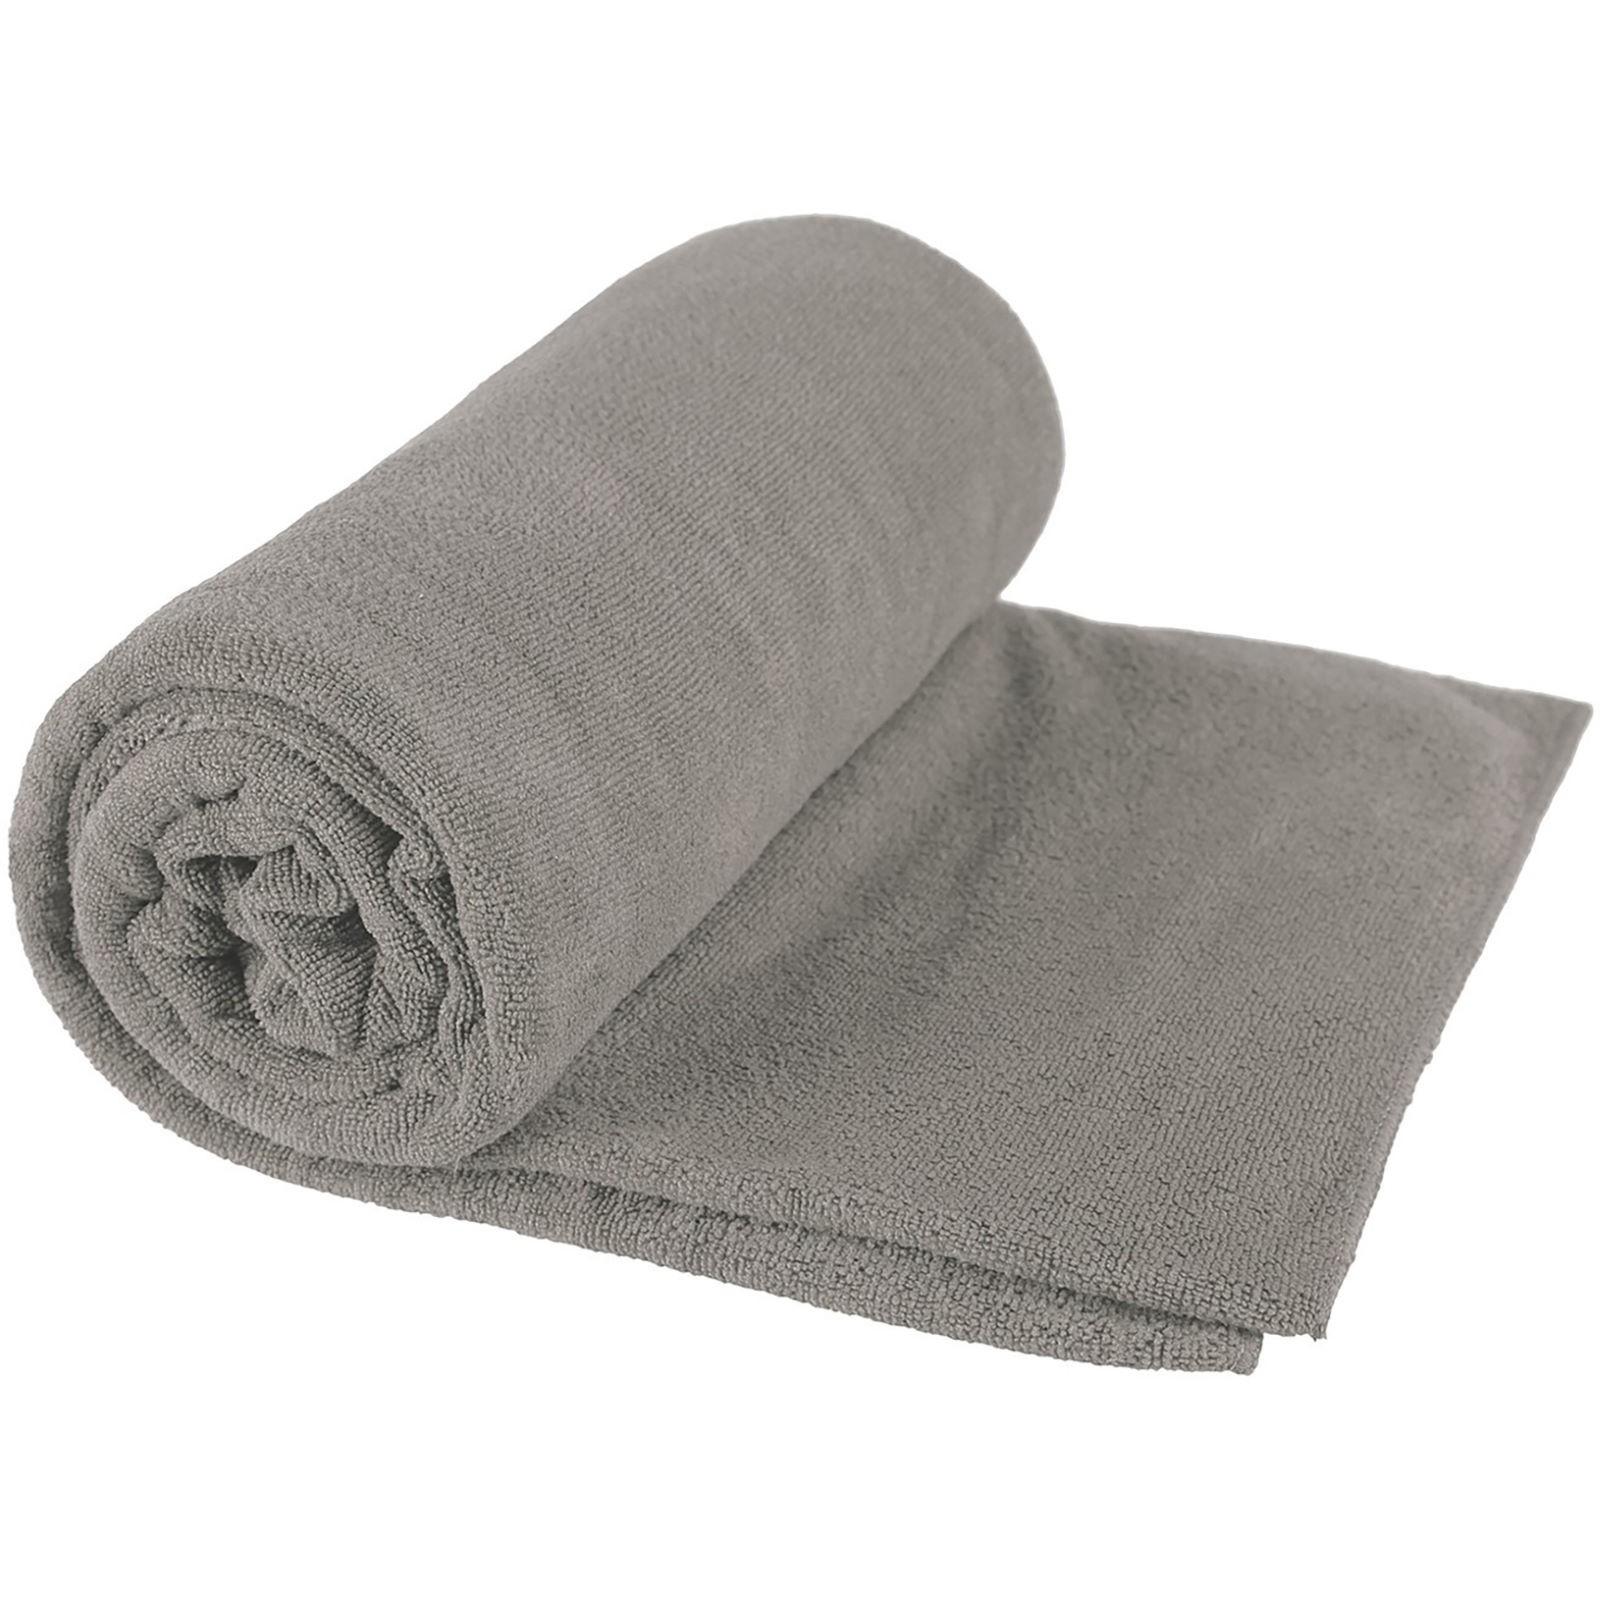 SEA TO SUMMIT - Tek Towel - Grey